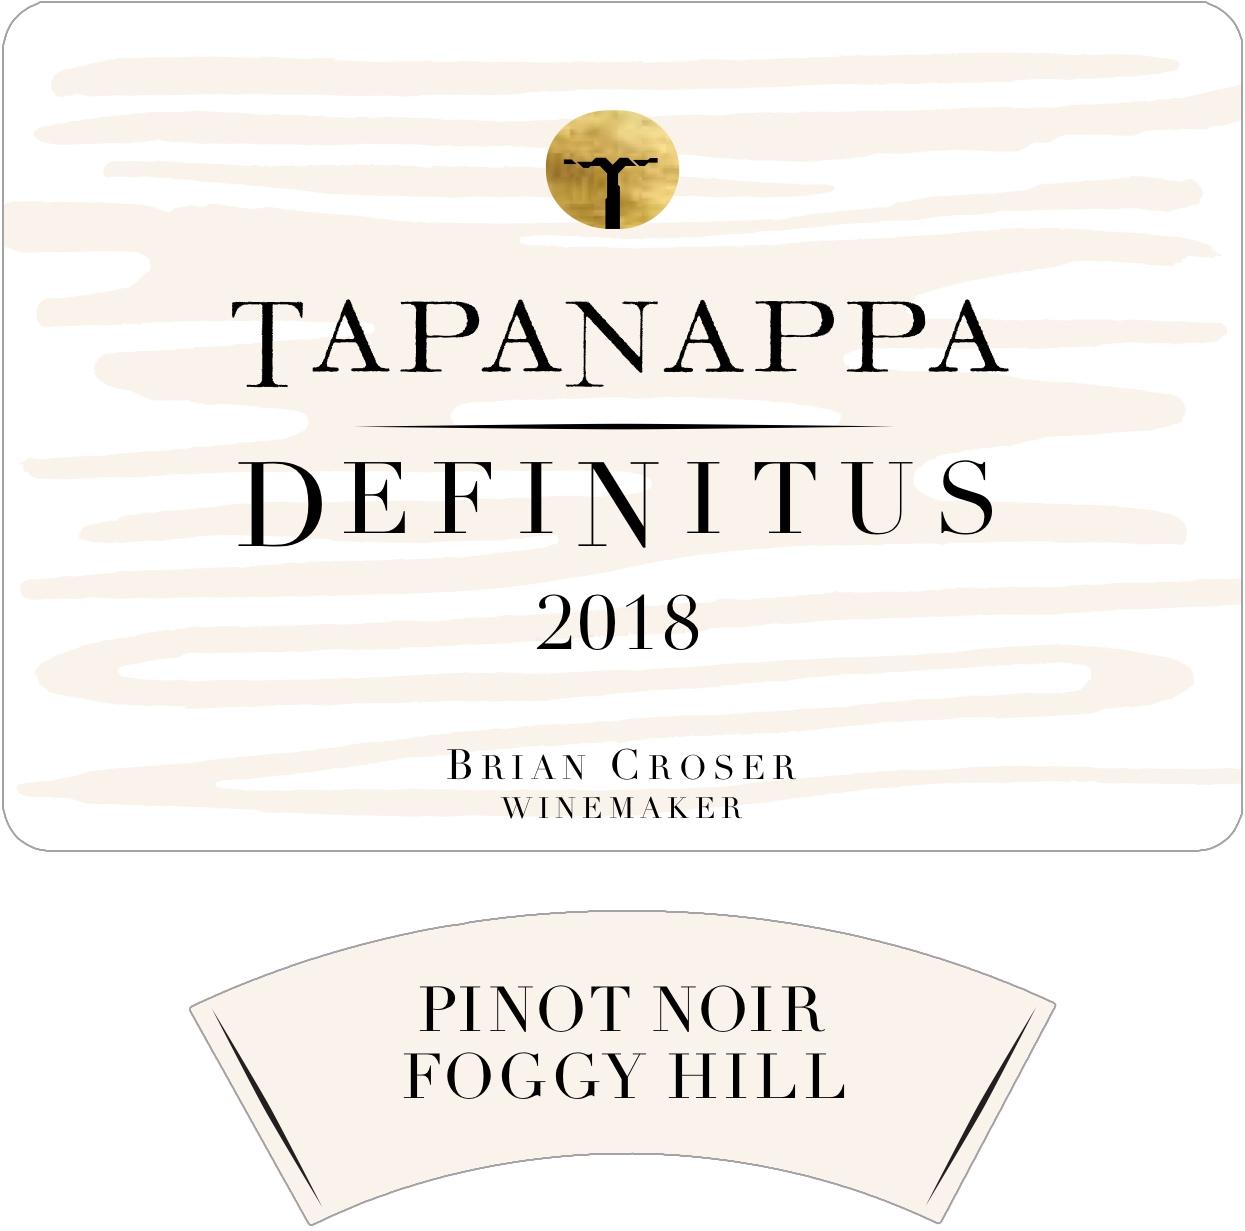 Tapanappa Foggy Hill Vineyard 2018 Definitus Pinot Noir label